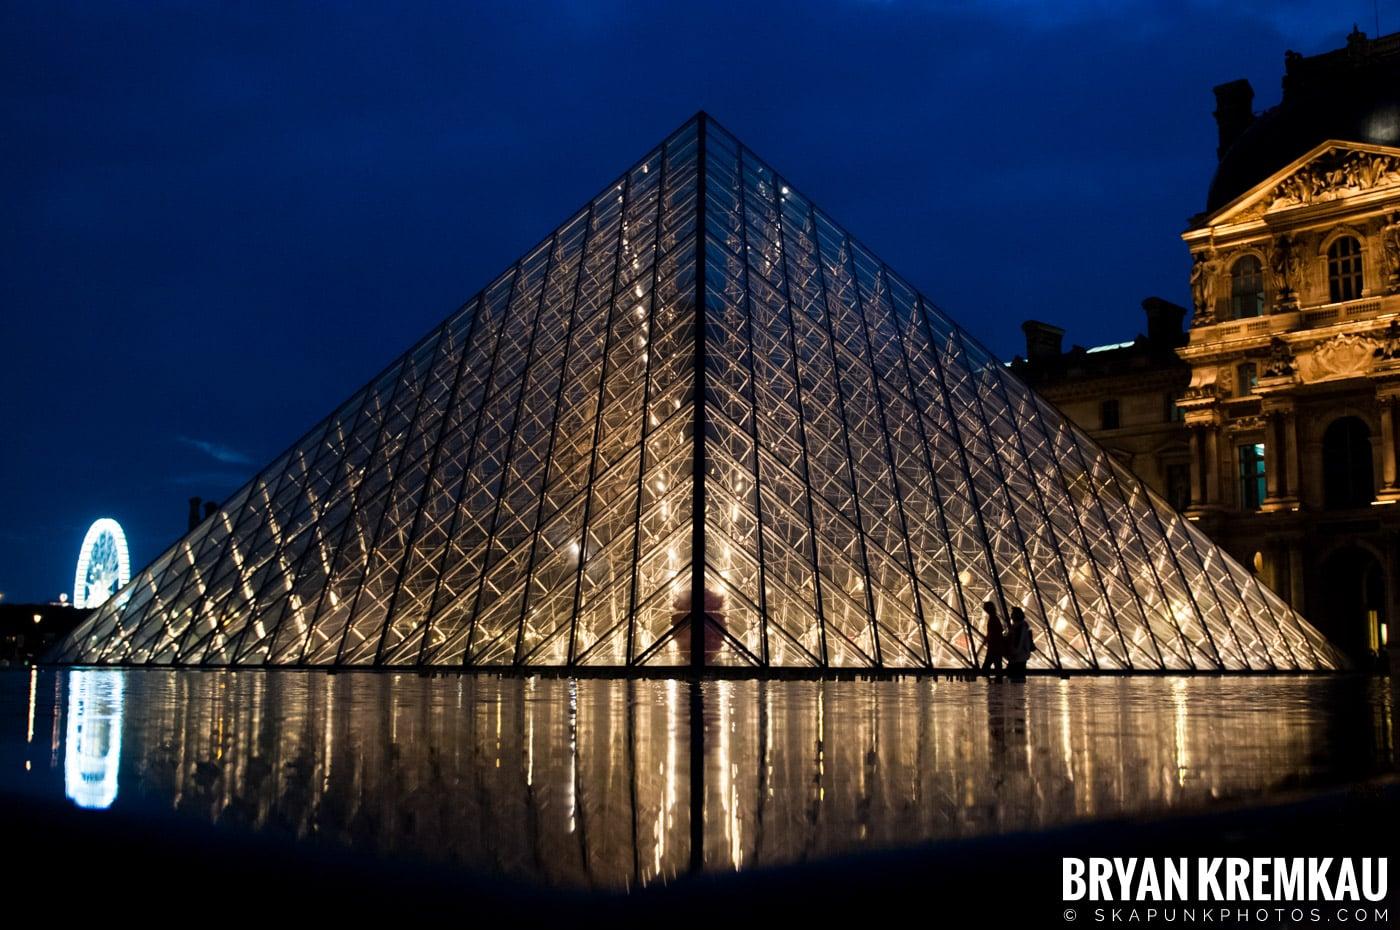 Paris, France Honeymoon - Day 4 - 7.21.11 (81)